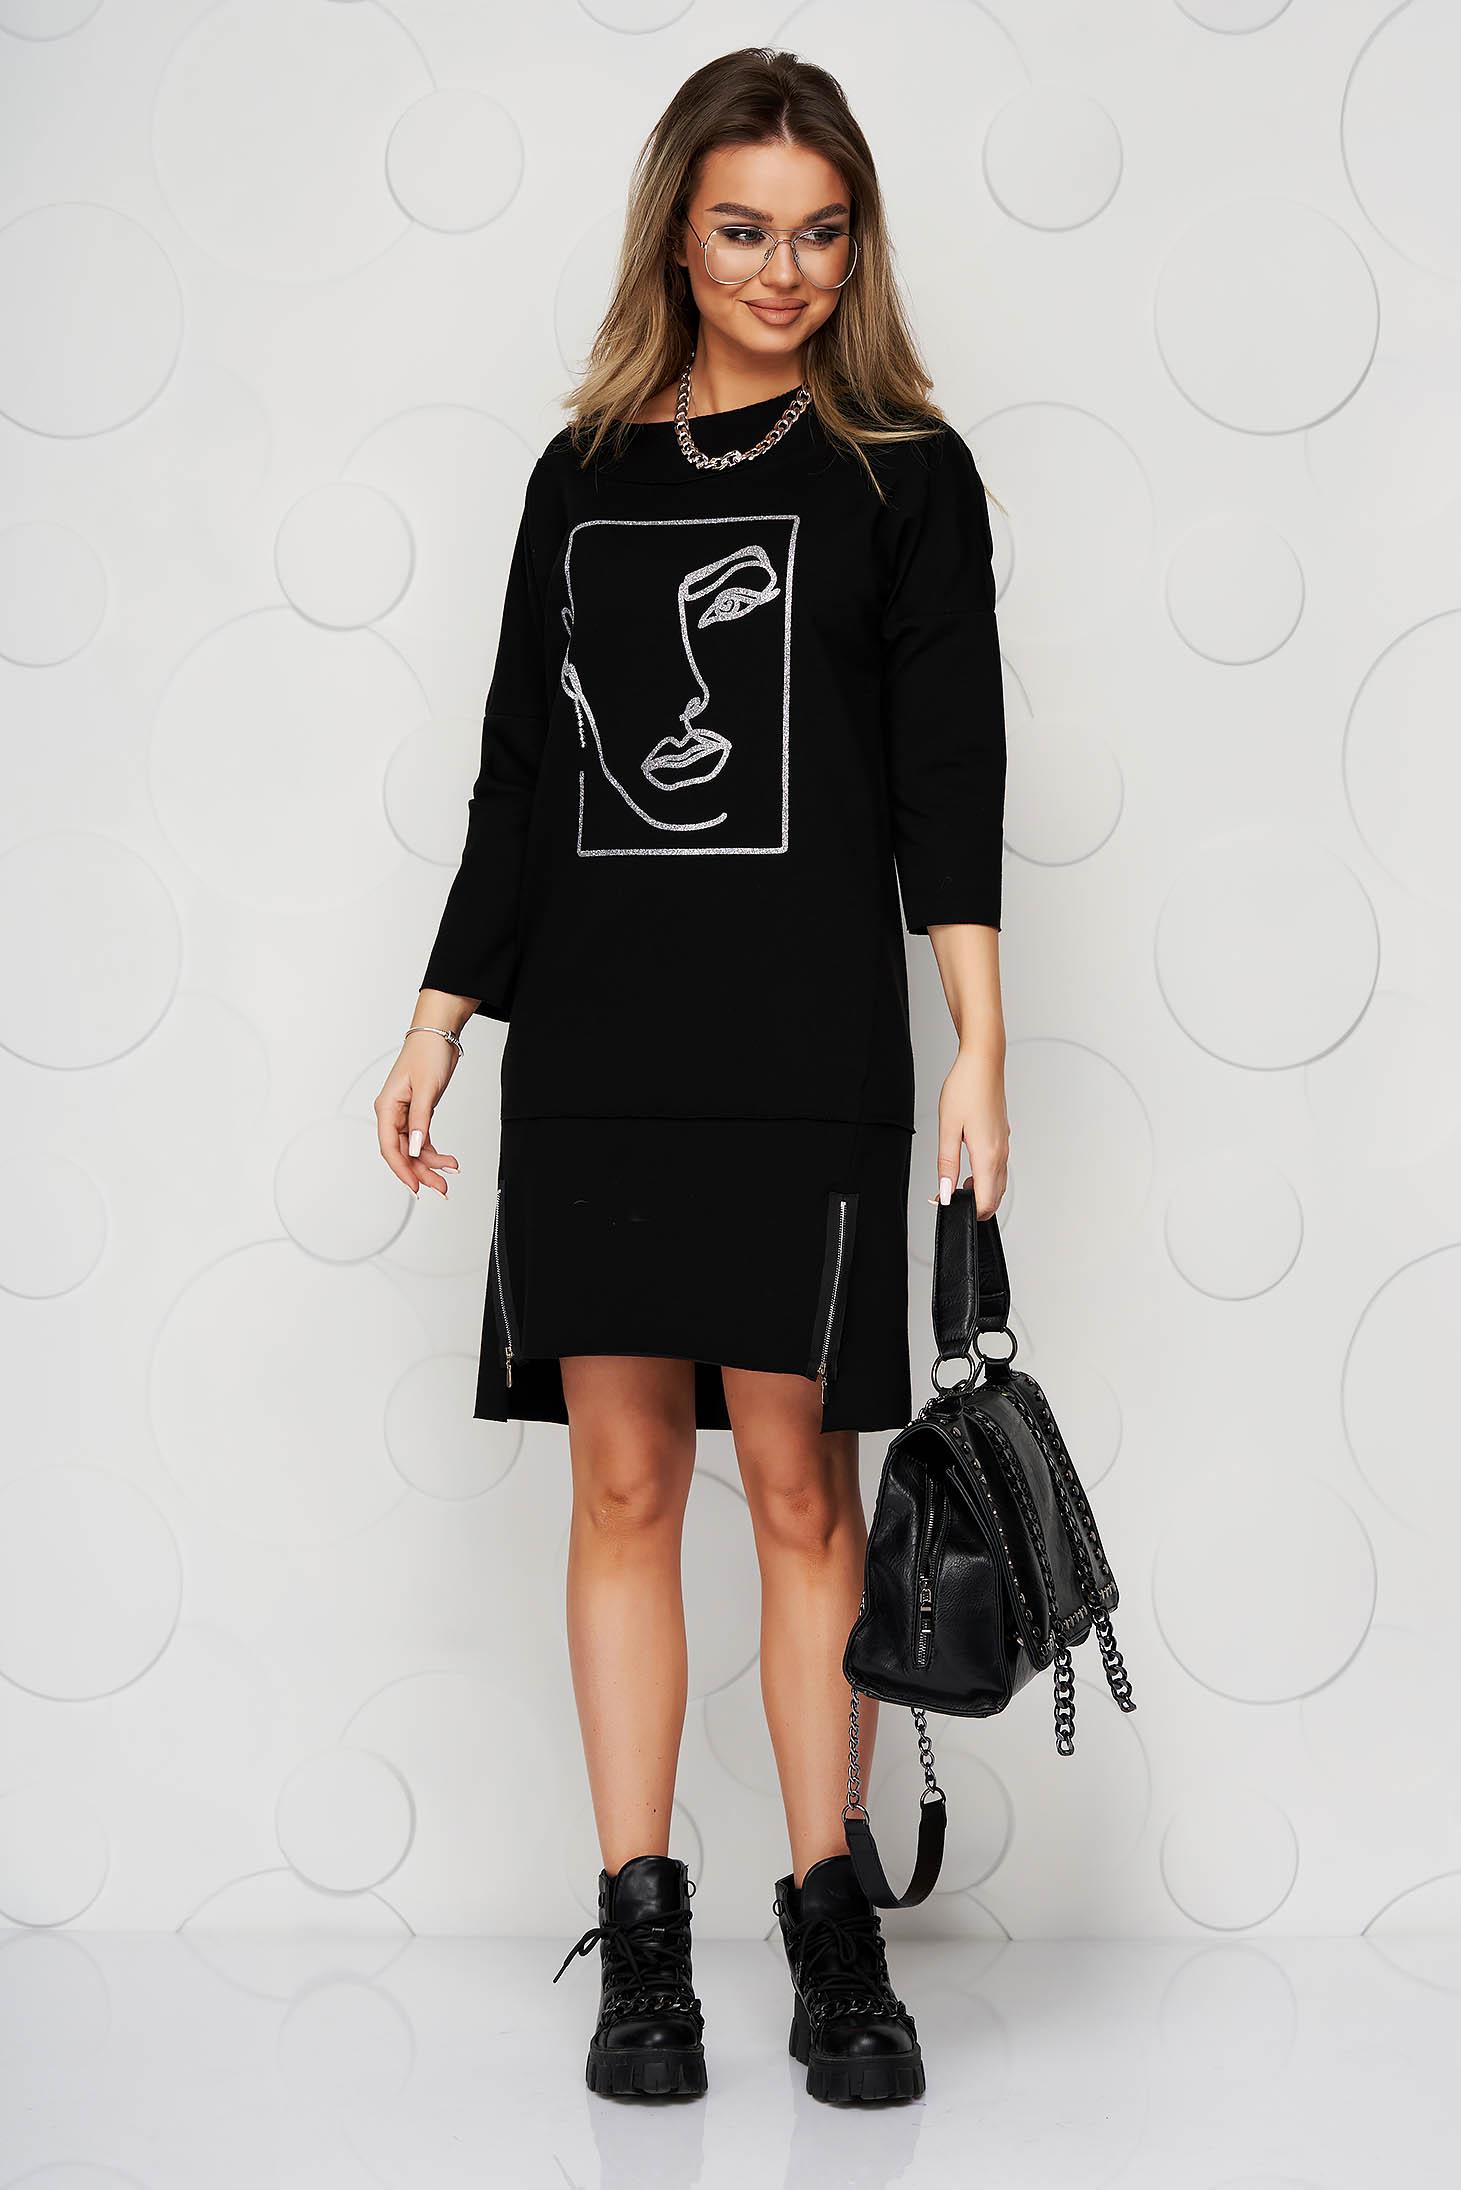 Rochie Lady Pandora neagra din bumbac elastic cu croi larg cu imprimeuri grafice si slituri frontal